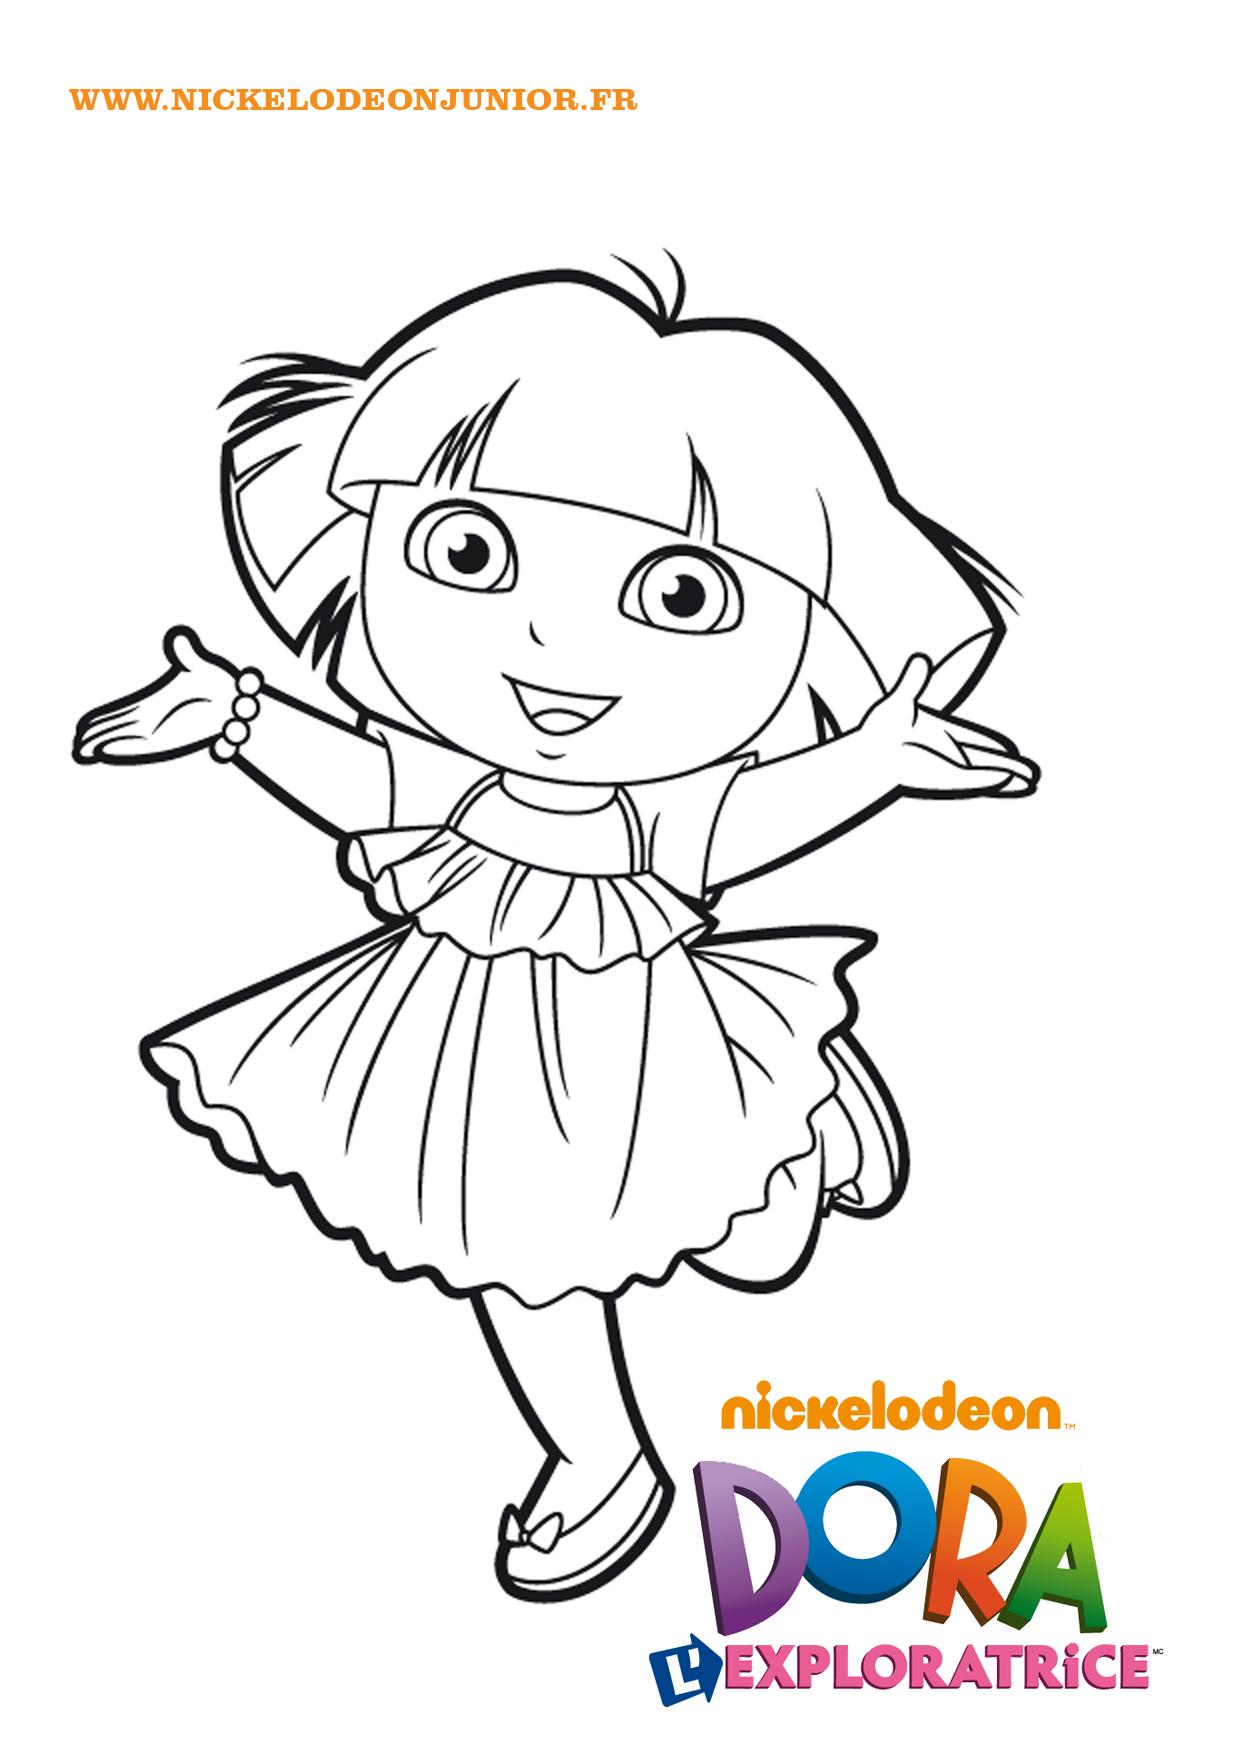 130 dessins de coloriage dora imprimer sur page 1 - Dessin anime dora exploratrice gratuit ...